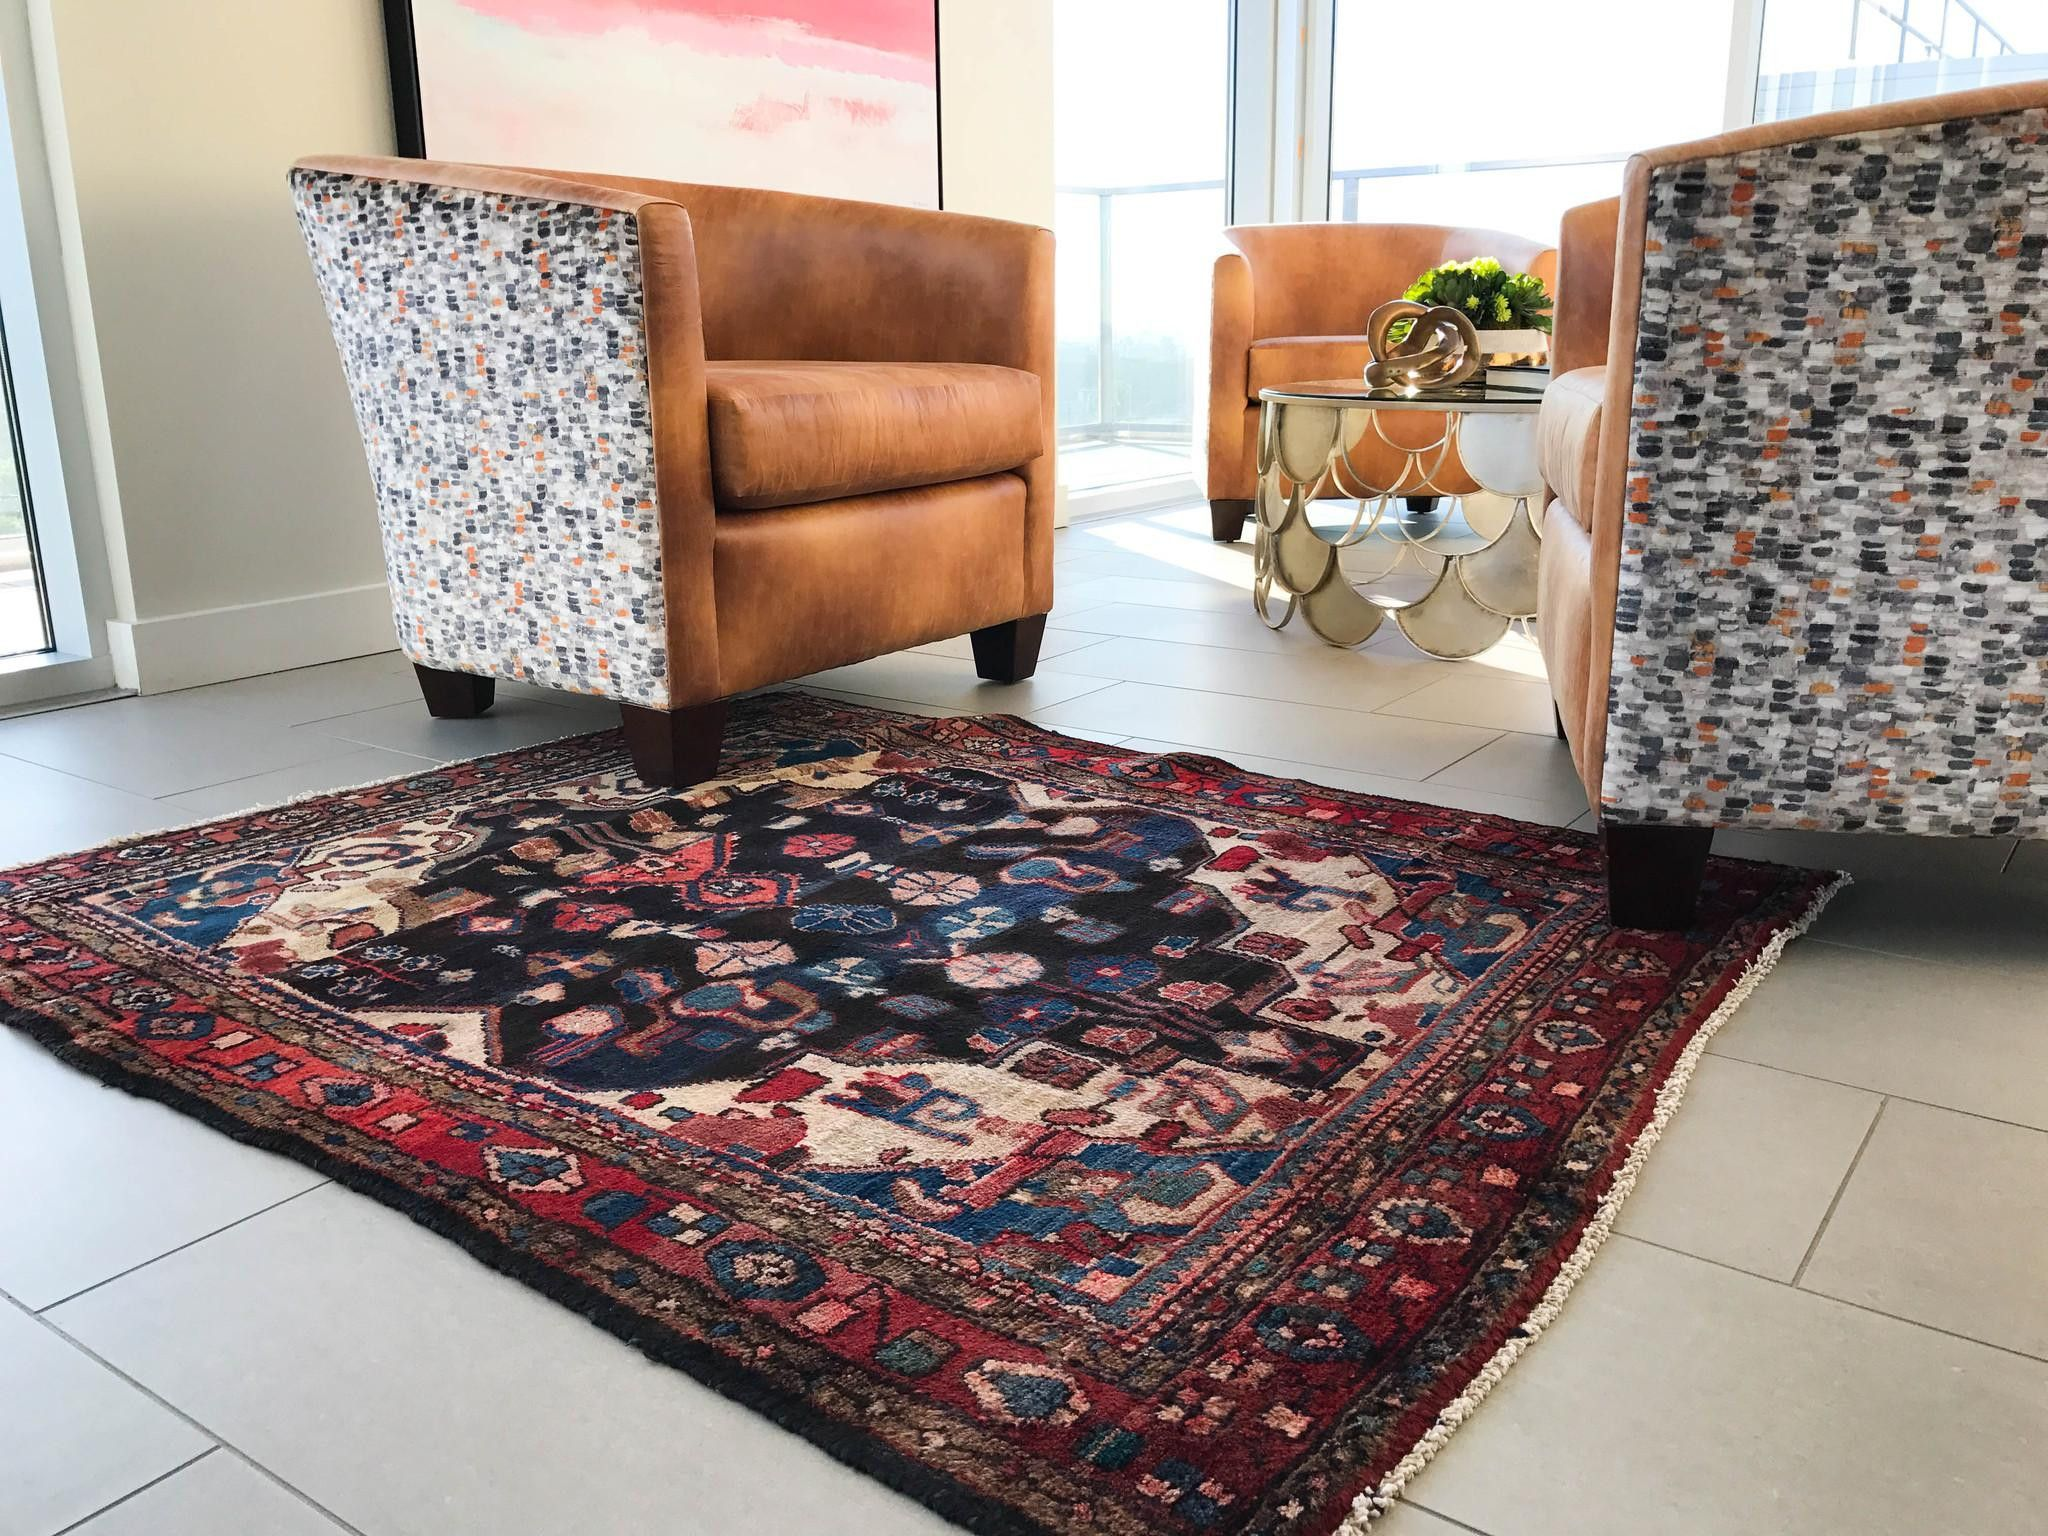 4x4 vintage persian rug blue rug area rug boho rug